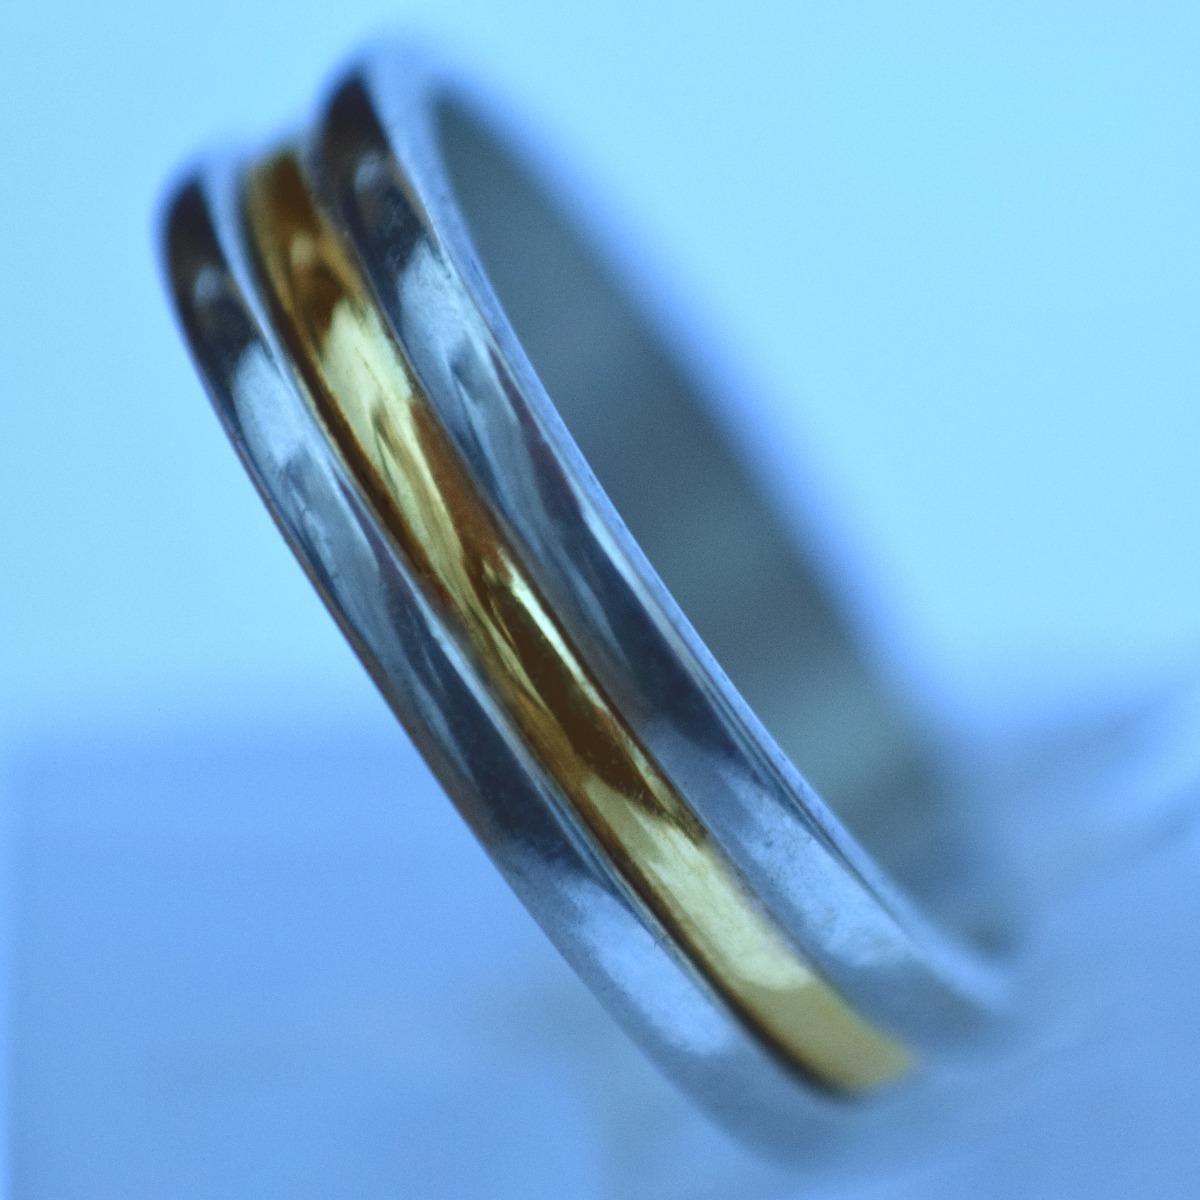 307c1e67d2f6 par alianzas plata 925 oro 18k casamiento boda matrimonio. Cargando zoom.